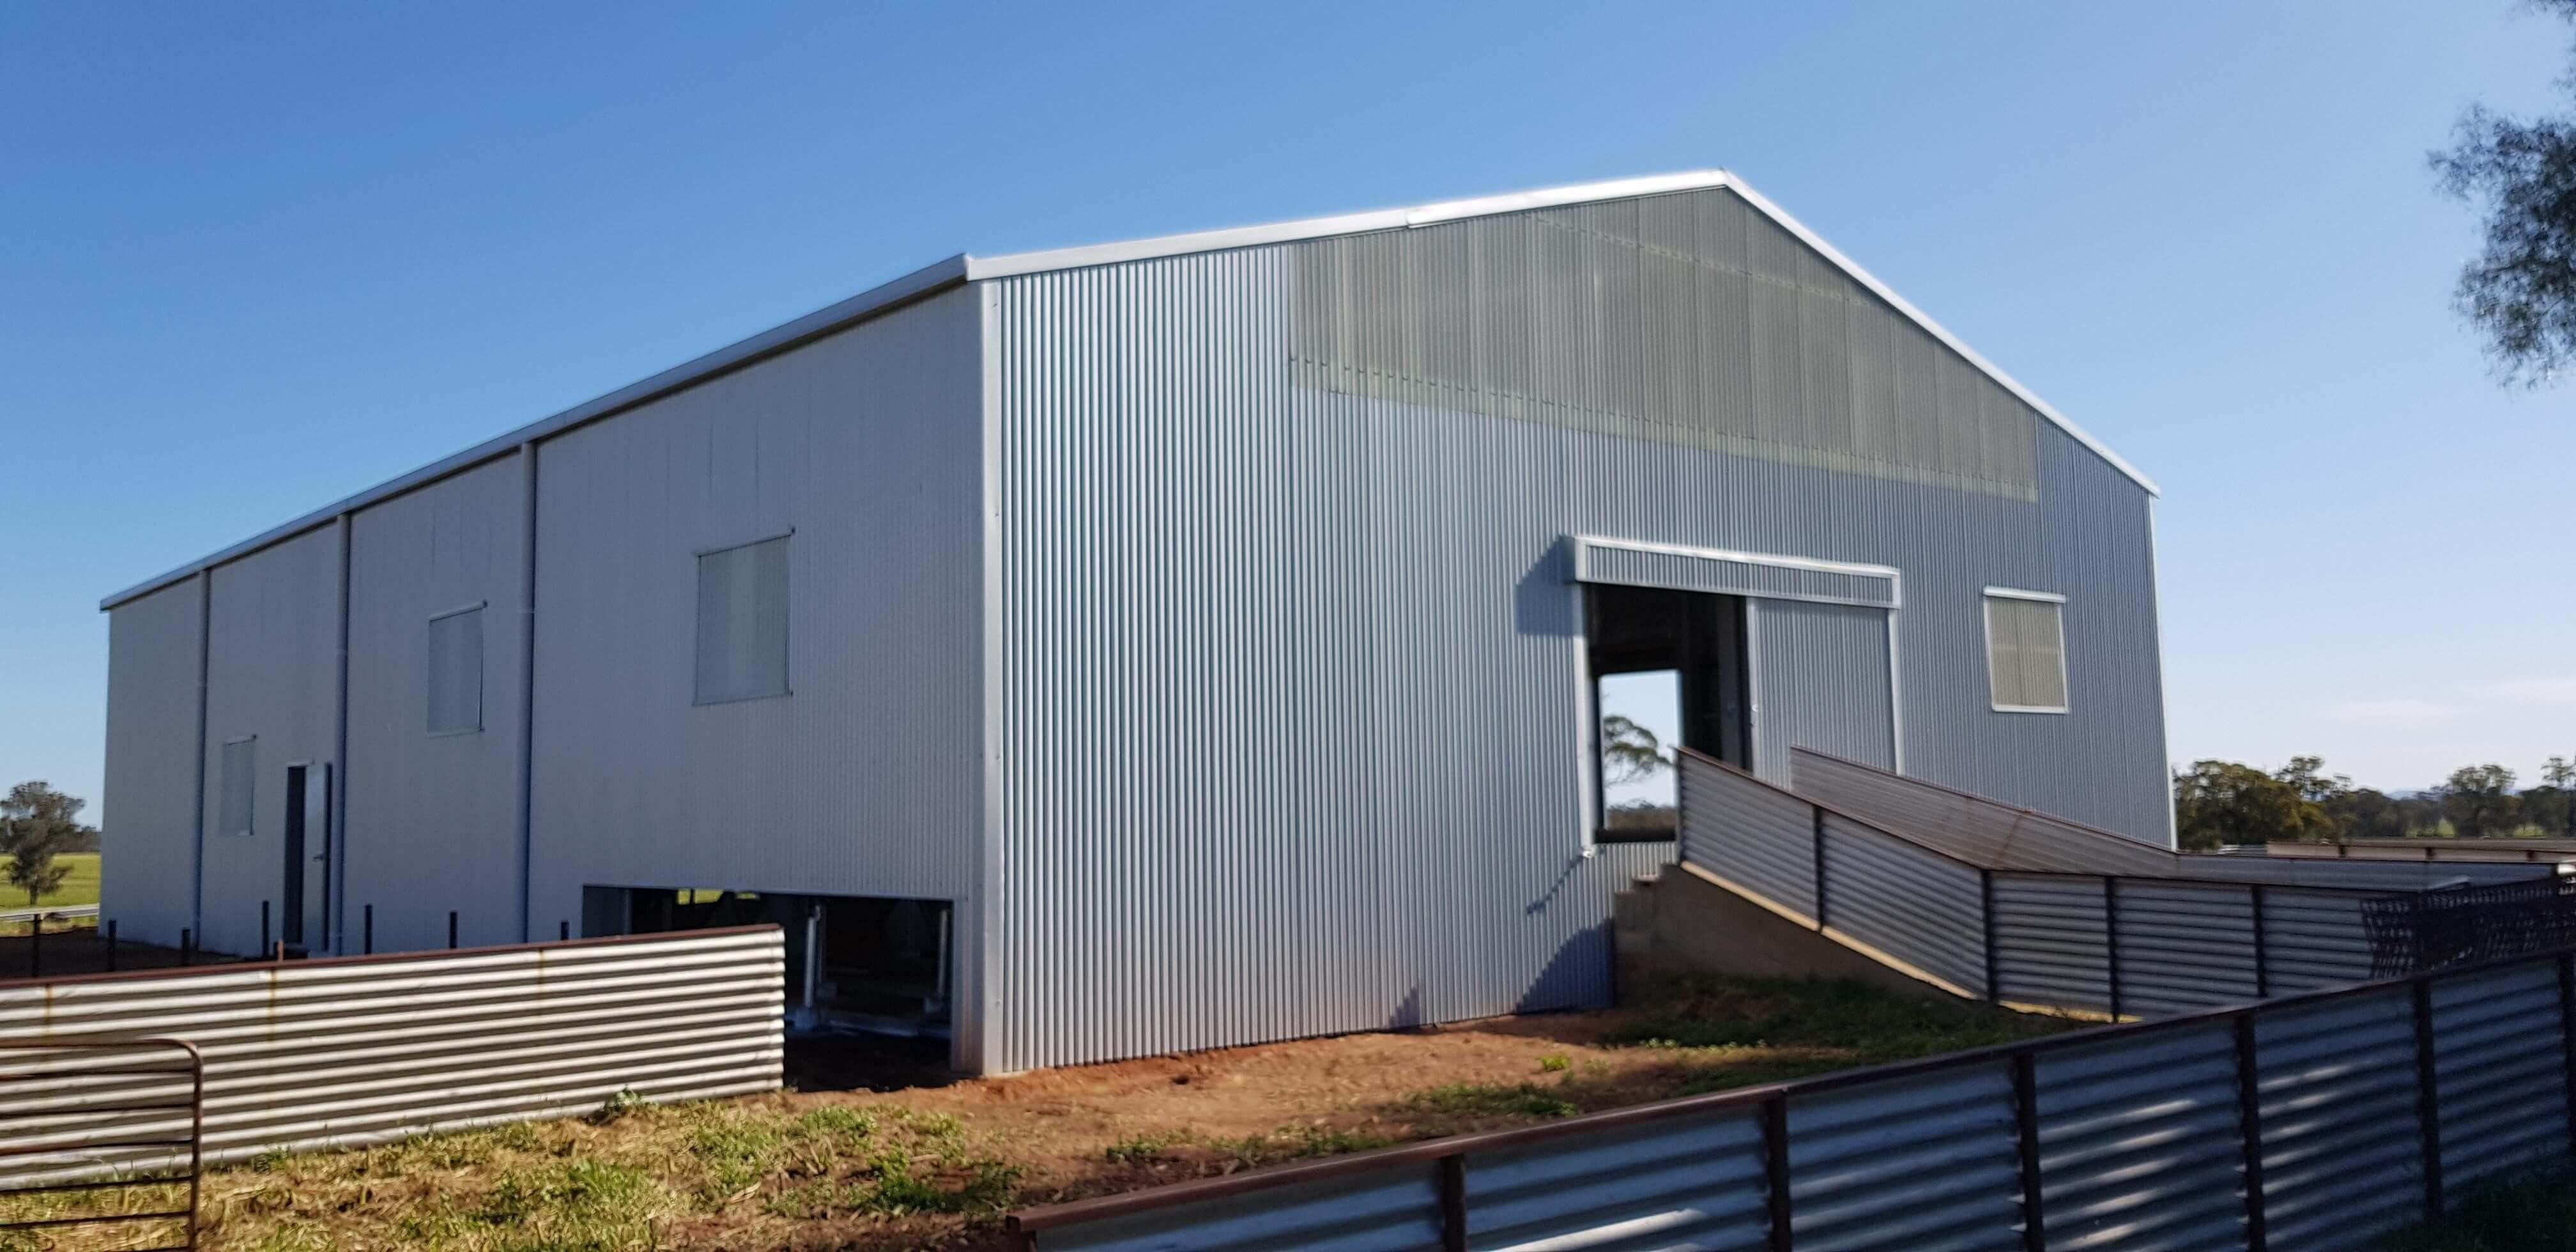 Shearing shed and yards